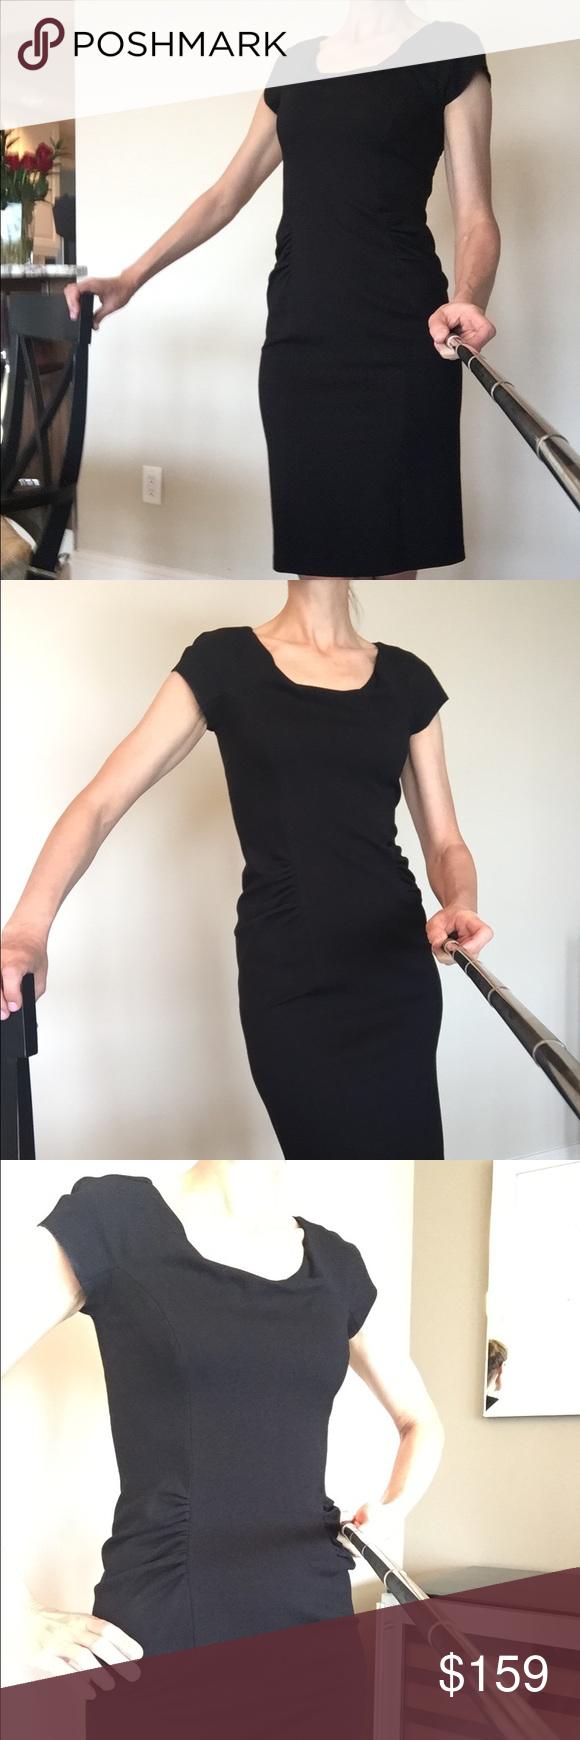 Armani Collezioni Black Dress Black Dress Flattering Fashion Dresses [ 1740 x 580 Pixel ]